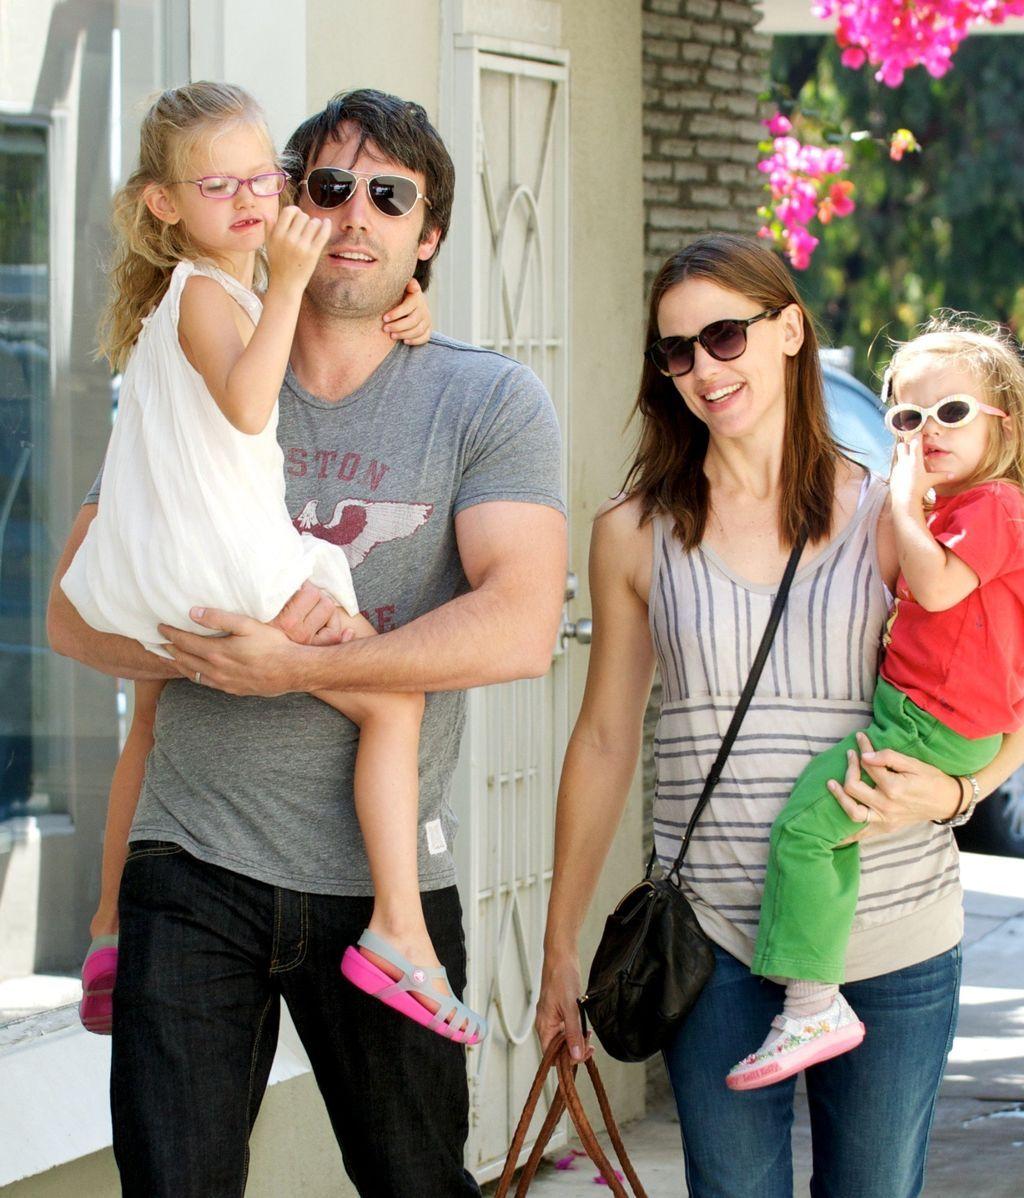 Ben Affleck, Jennifer Garner de compras por Los Angeles